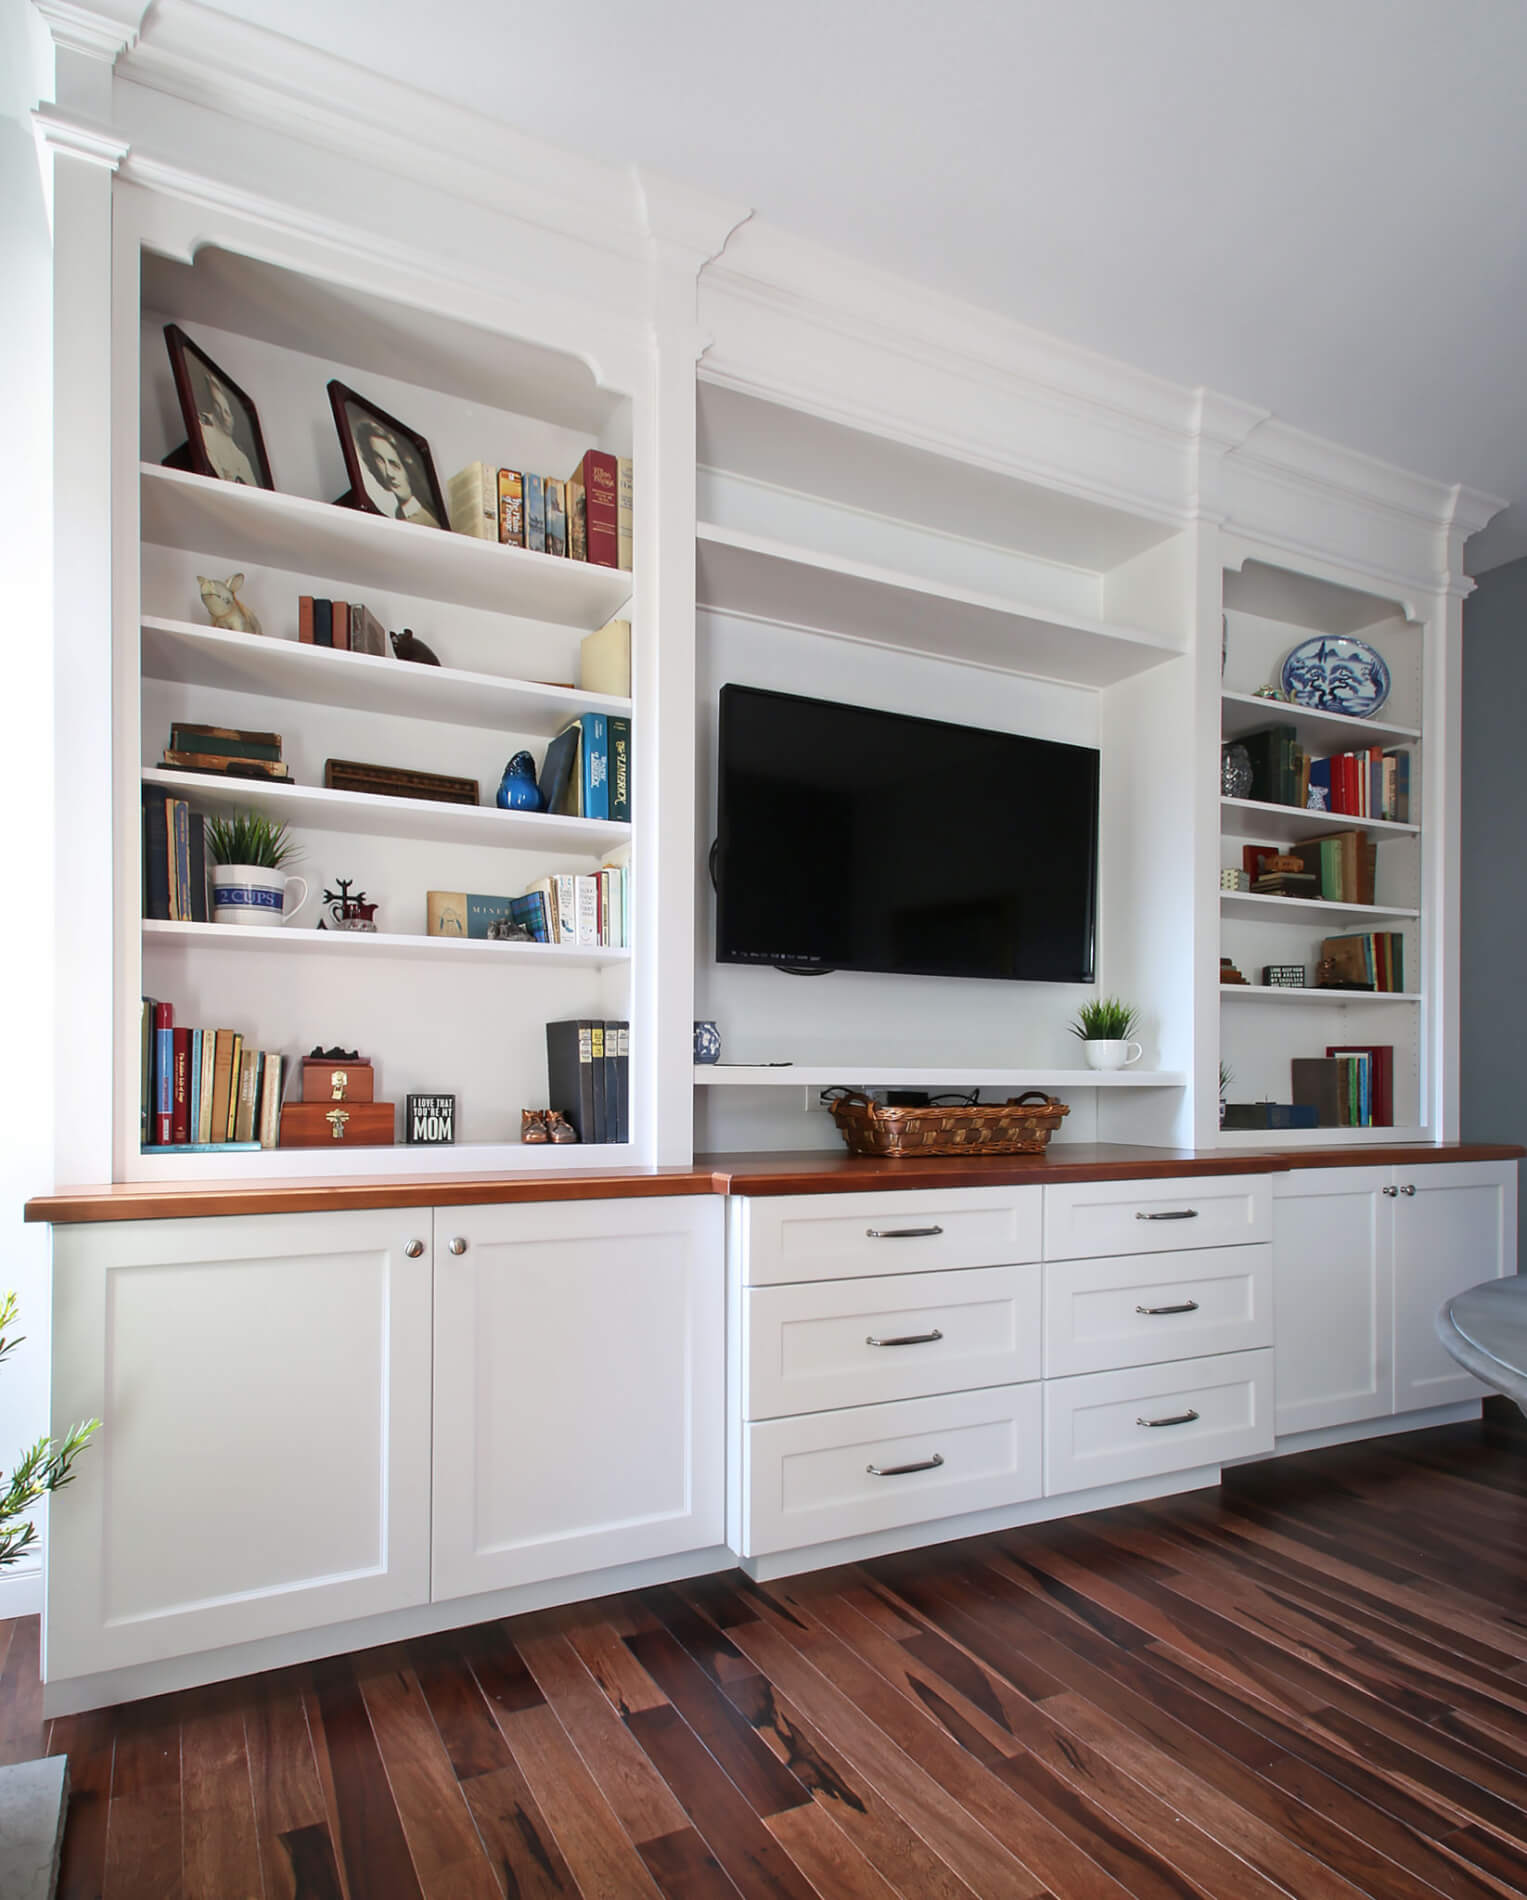 Built In Book Shelf Remodel in Newport Beach, Orange County Family Room Remodel